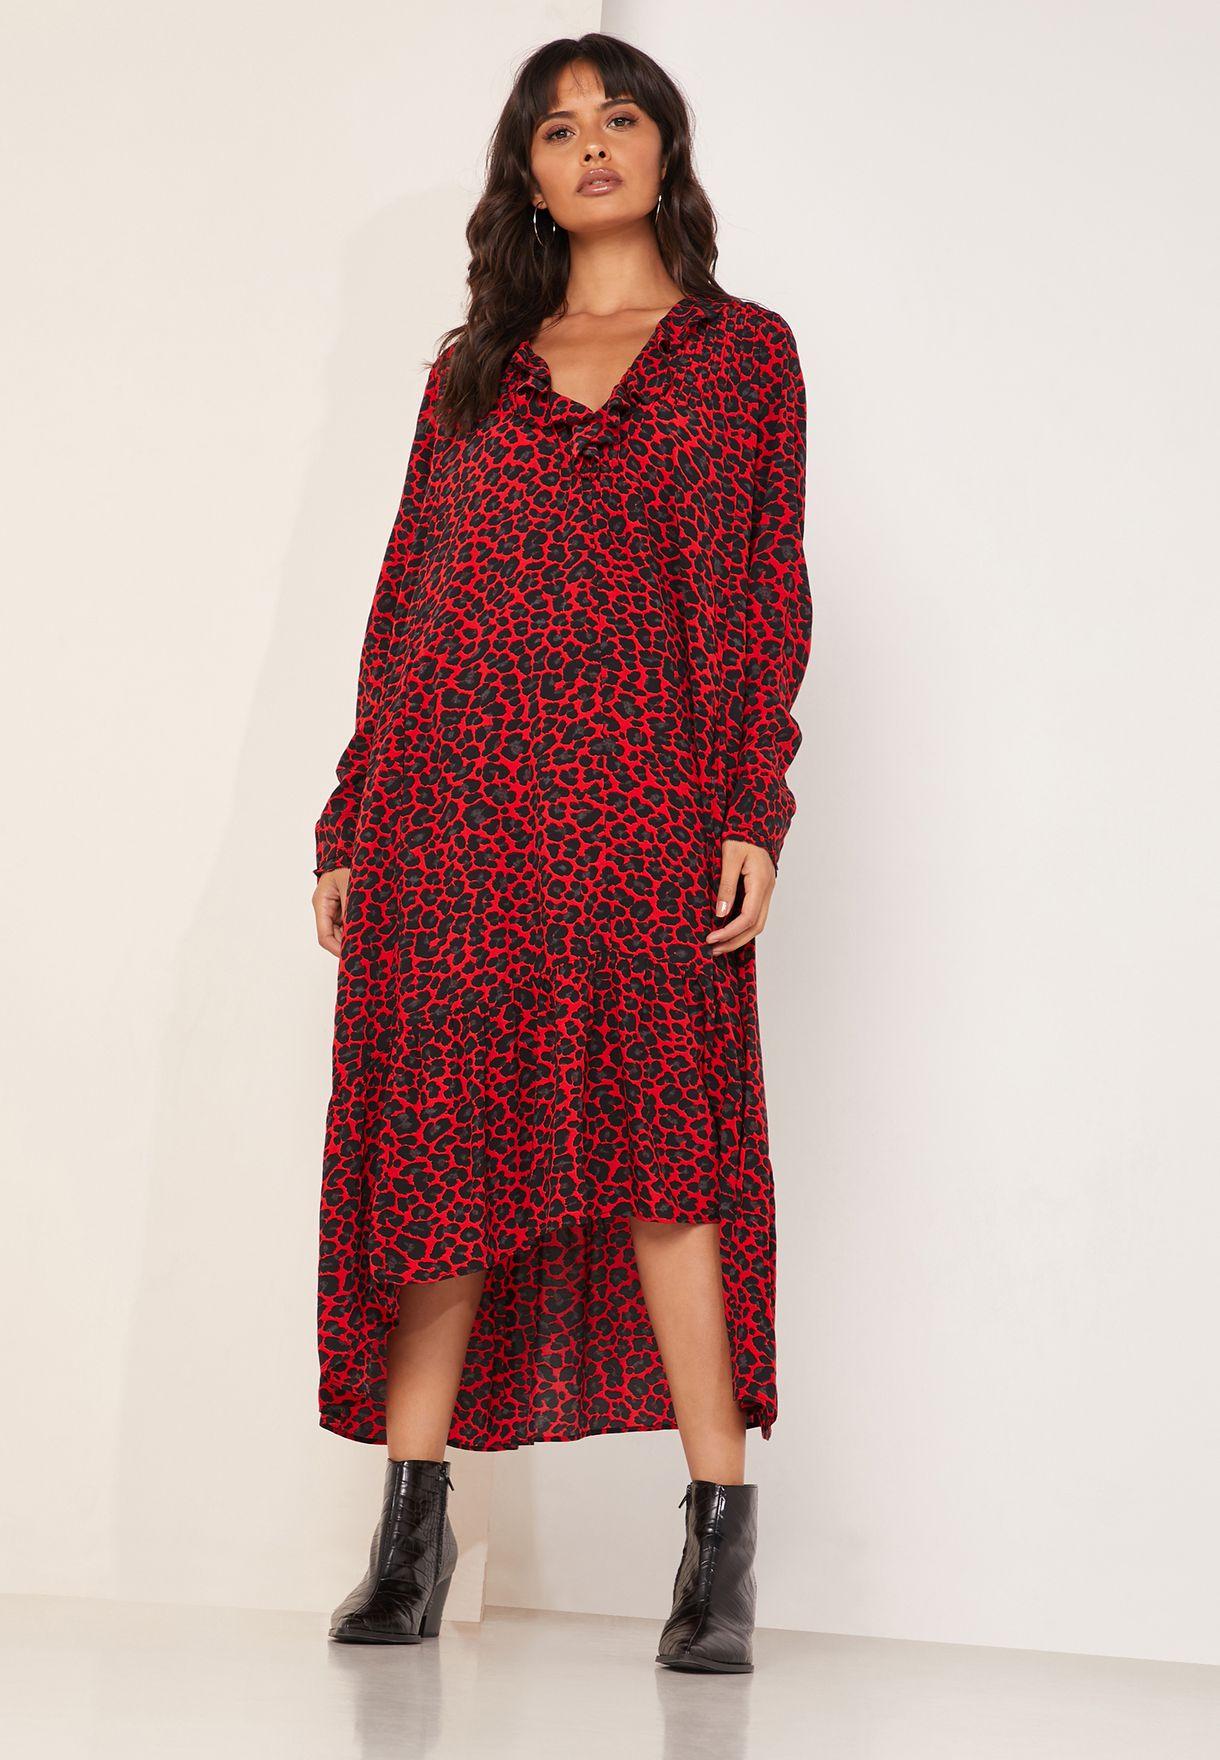 Ruffled V-Neck Leopard Print Dress